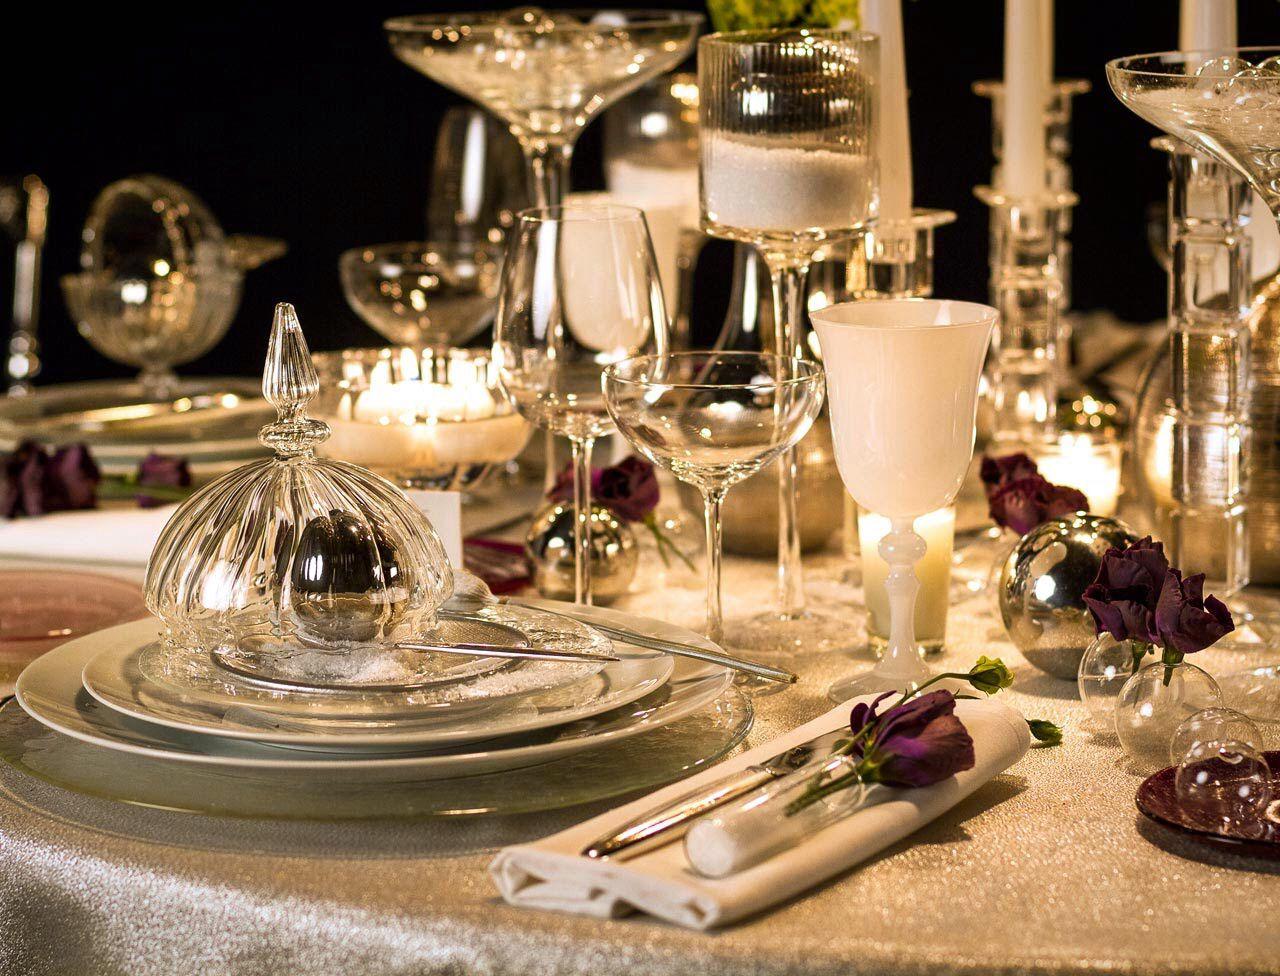 image issue du site web http 3 bp blogspot com p pyfhdmwds vhho6fpknni aaaaaaaadue cg l3uxs7q4 s1600 toutes nos idees pour une belle table de noel jpg